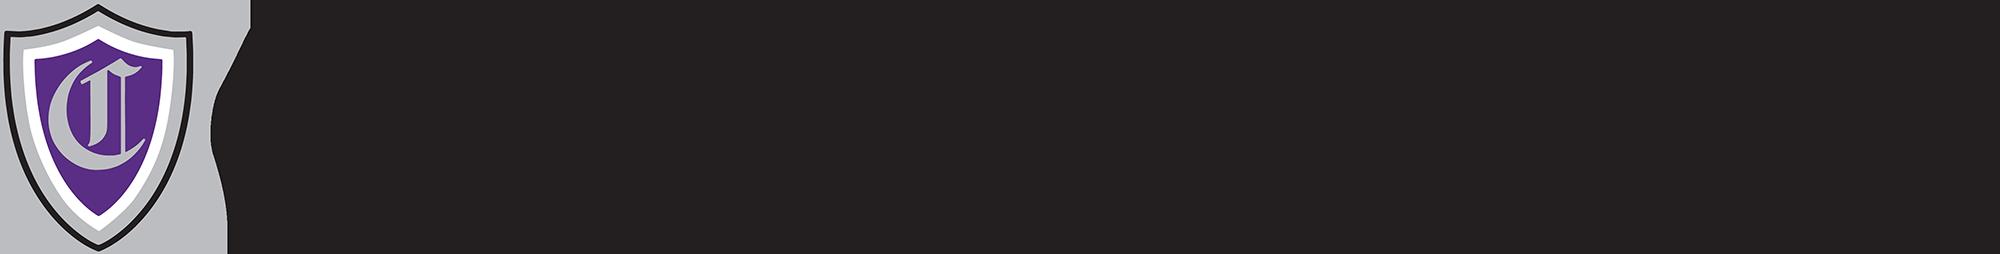 Chatham Charter School